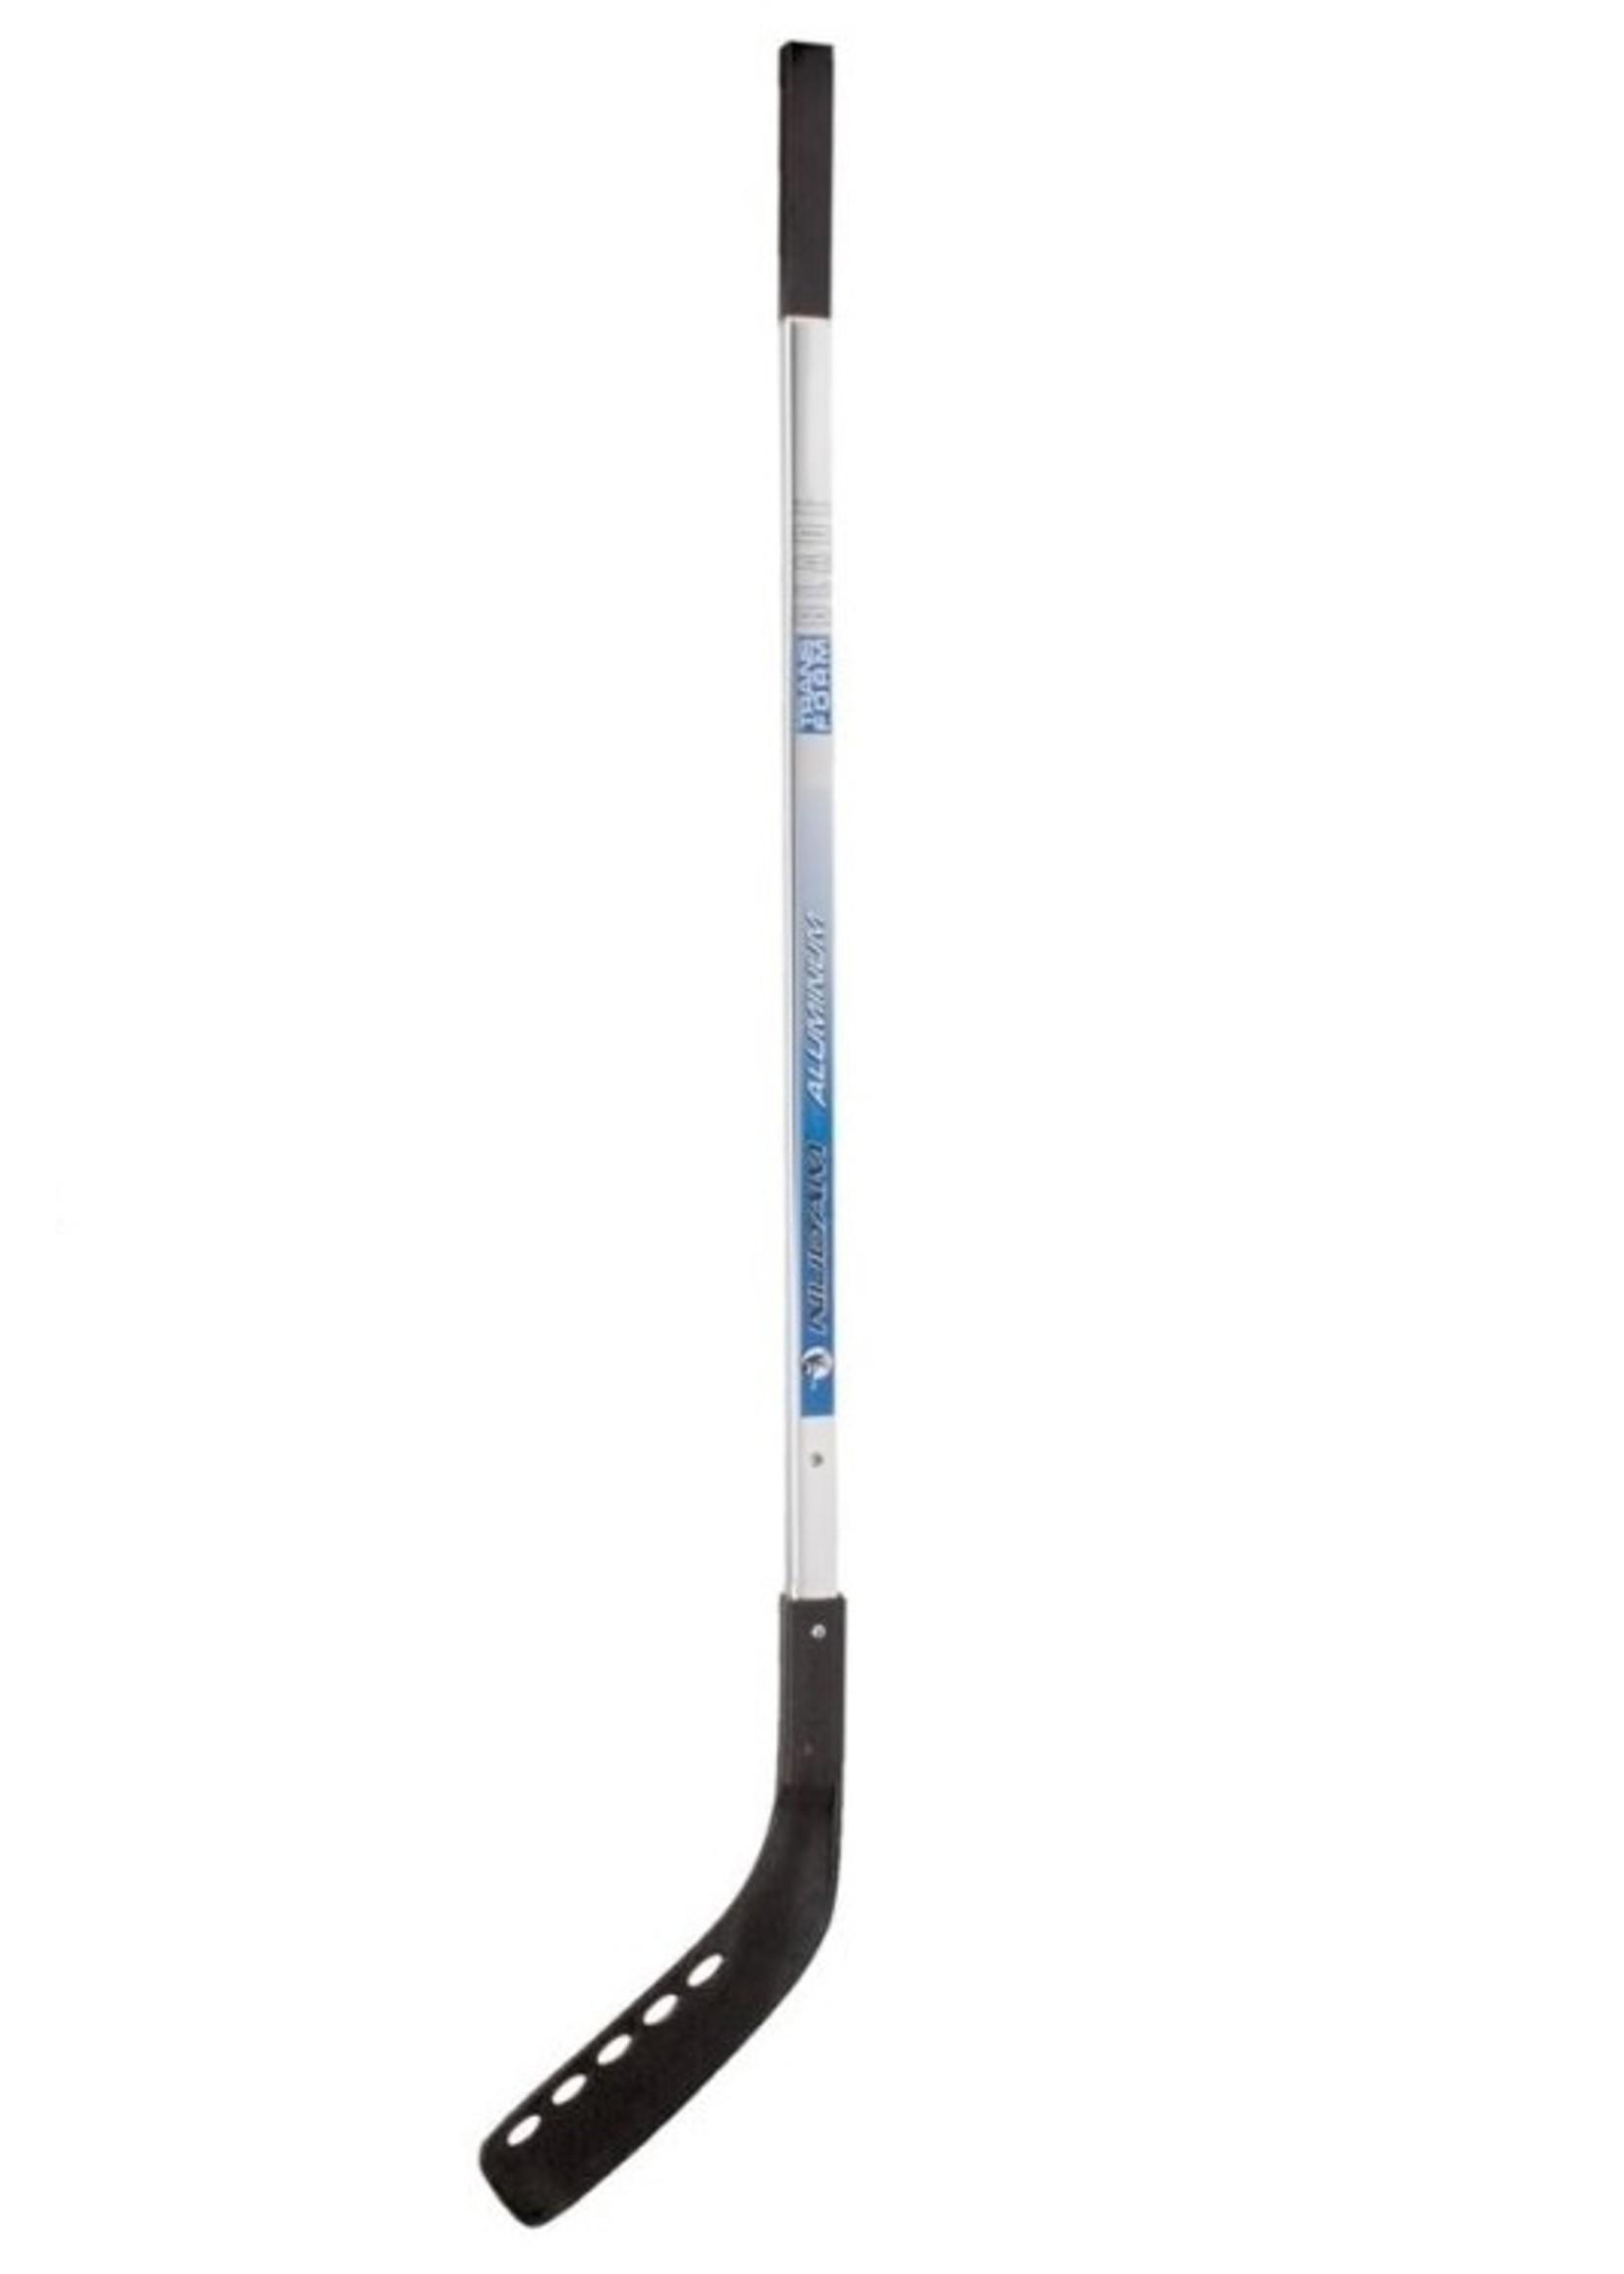 Nijdam Nijdam Hockeystick Aluminium 135 cm 0181 Zilver, blauw en oranje